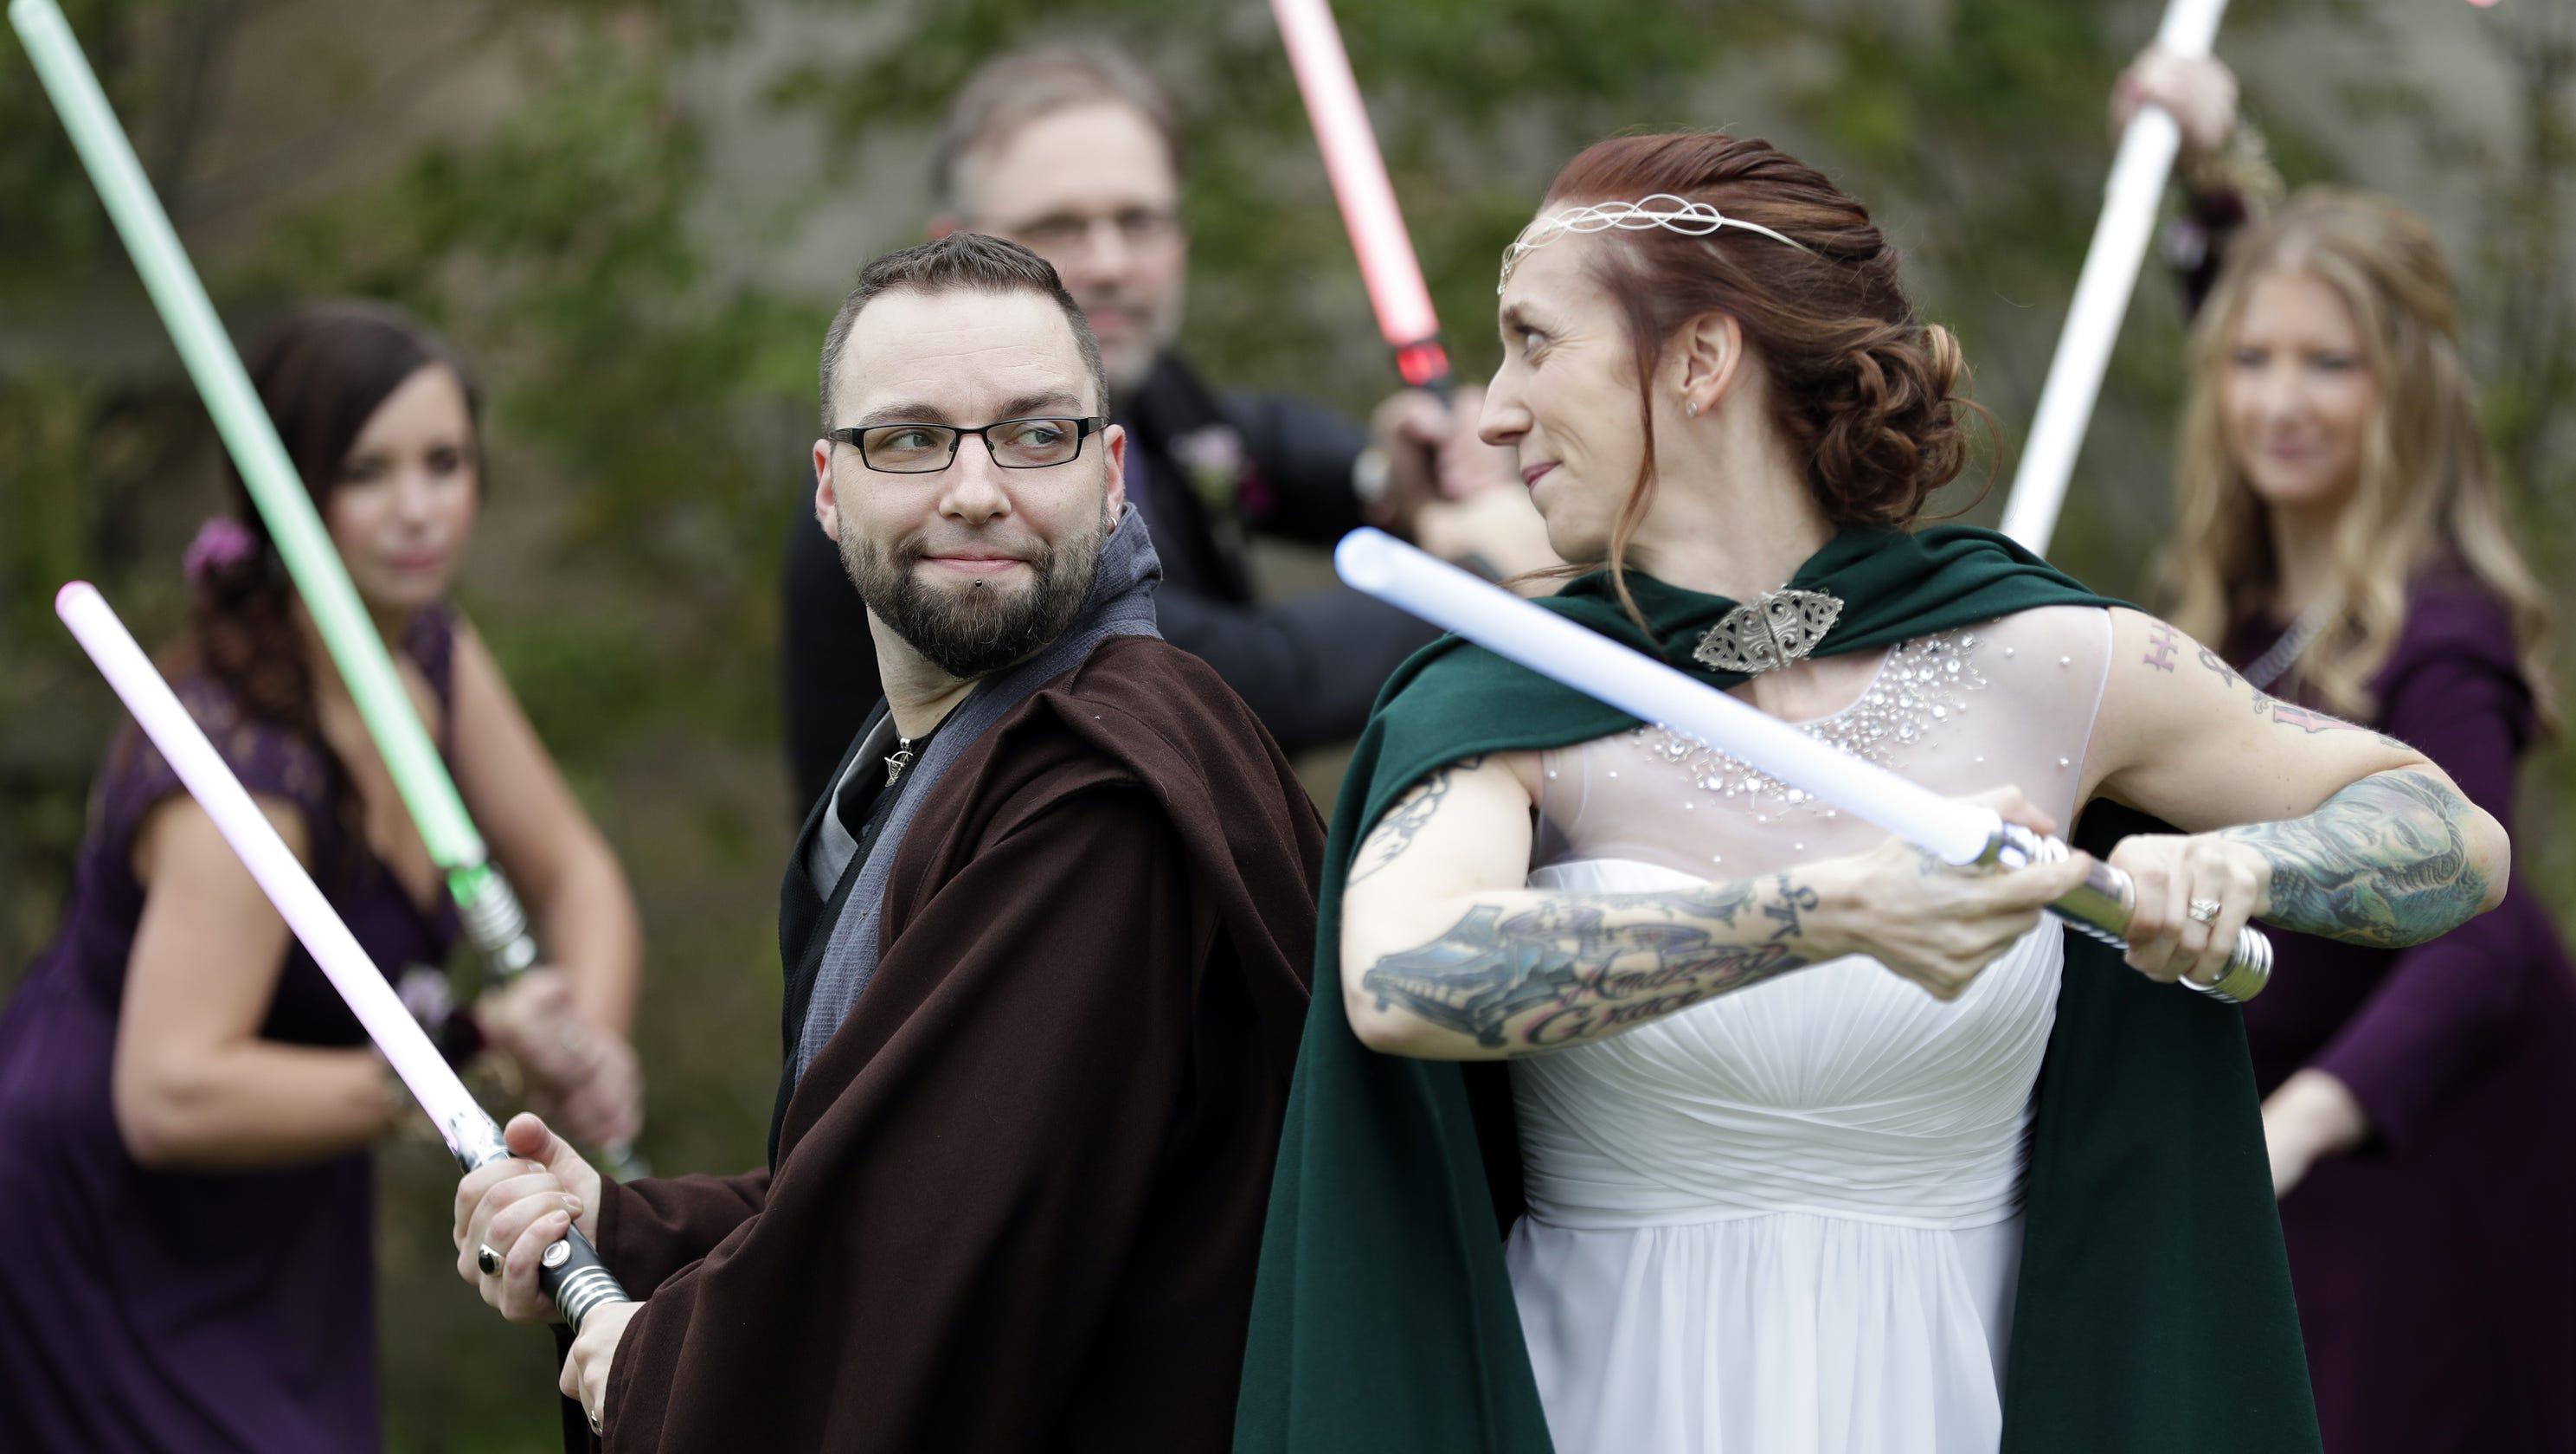 Star Wars Wedding.Star Wars Wedding Special Day Of Lightsabers Darth Vader